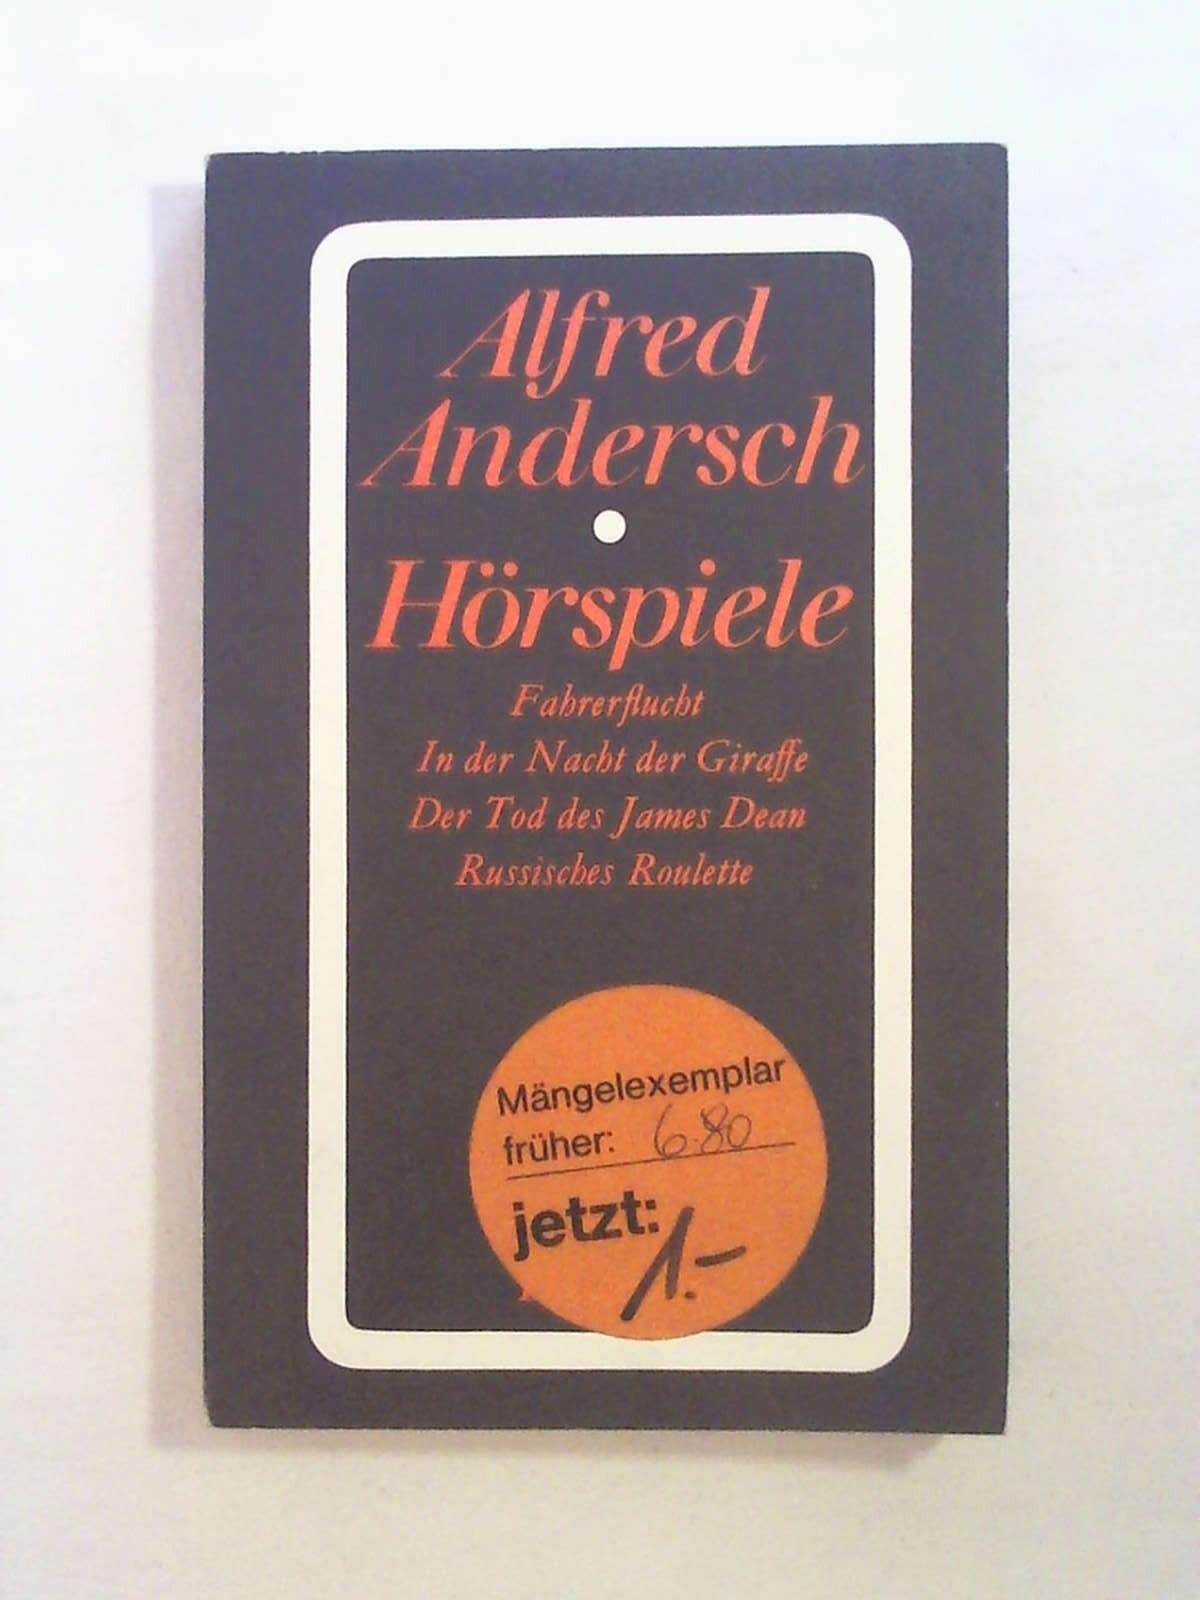 Horspiele: Alfred Andersch